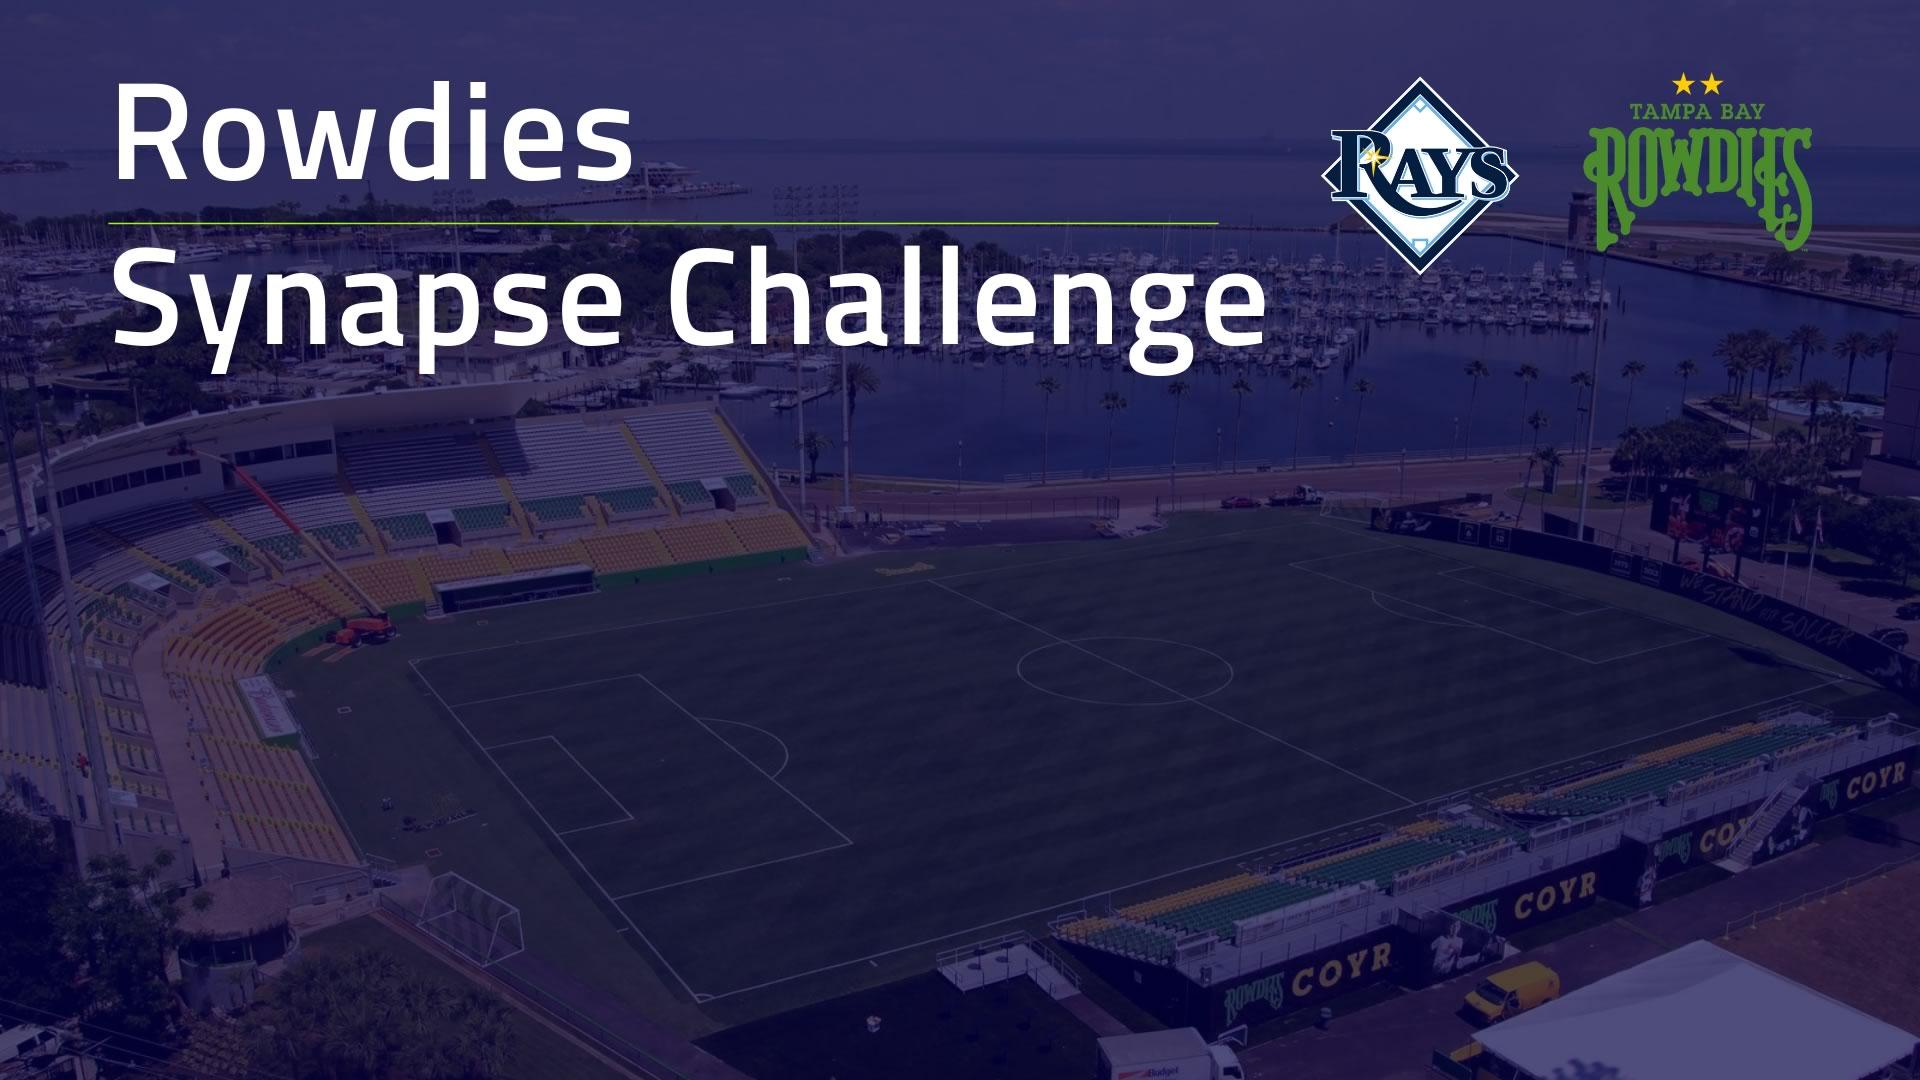 Rowdies Challenge